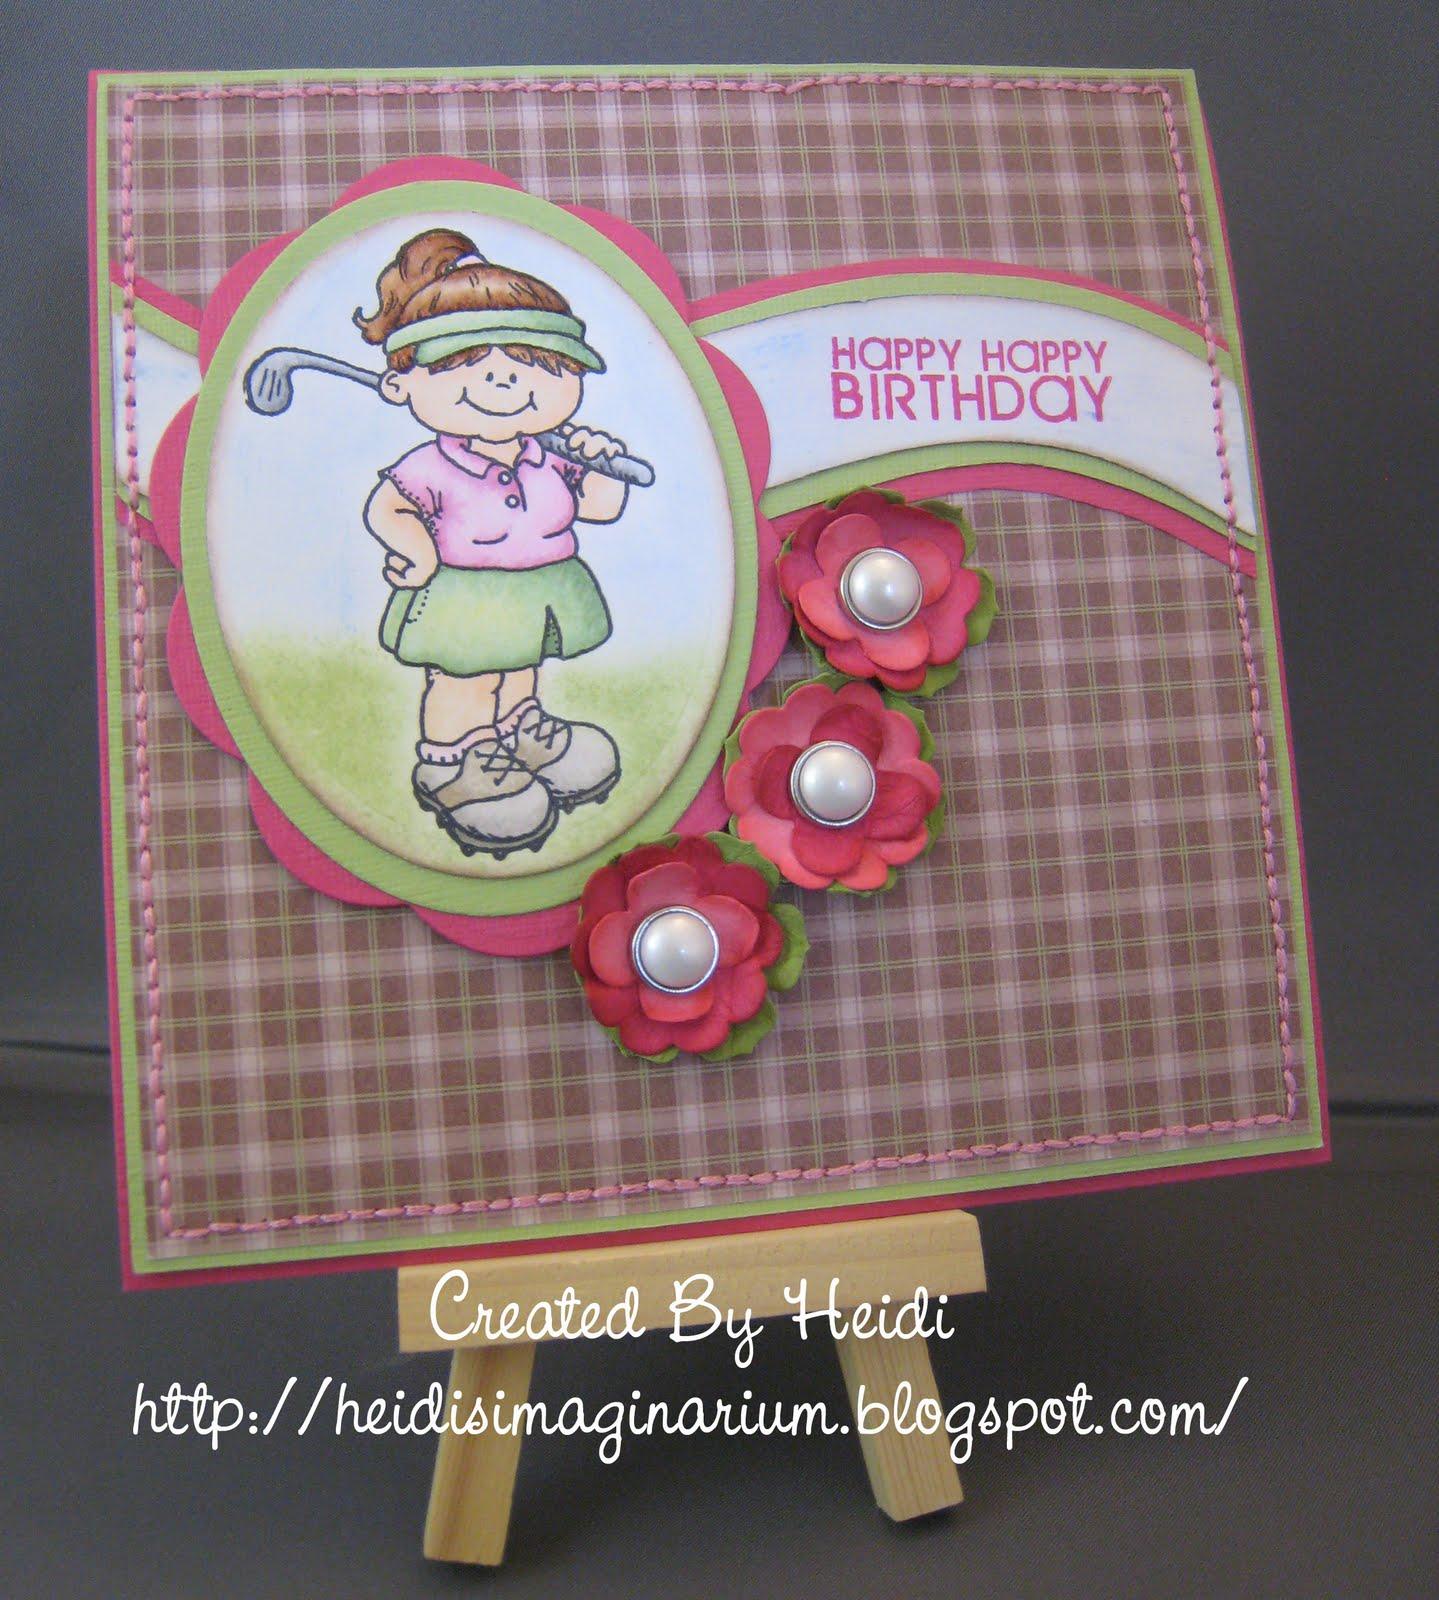 http://3.bp.blogspot.com/_InV4Xr1fH4w/S8JS0sfoo0I/AAAAAAAAALg/fiQaOHNzlLA/s1600/Golfing+plaid.jpg